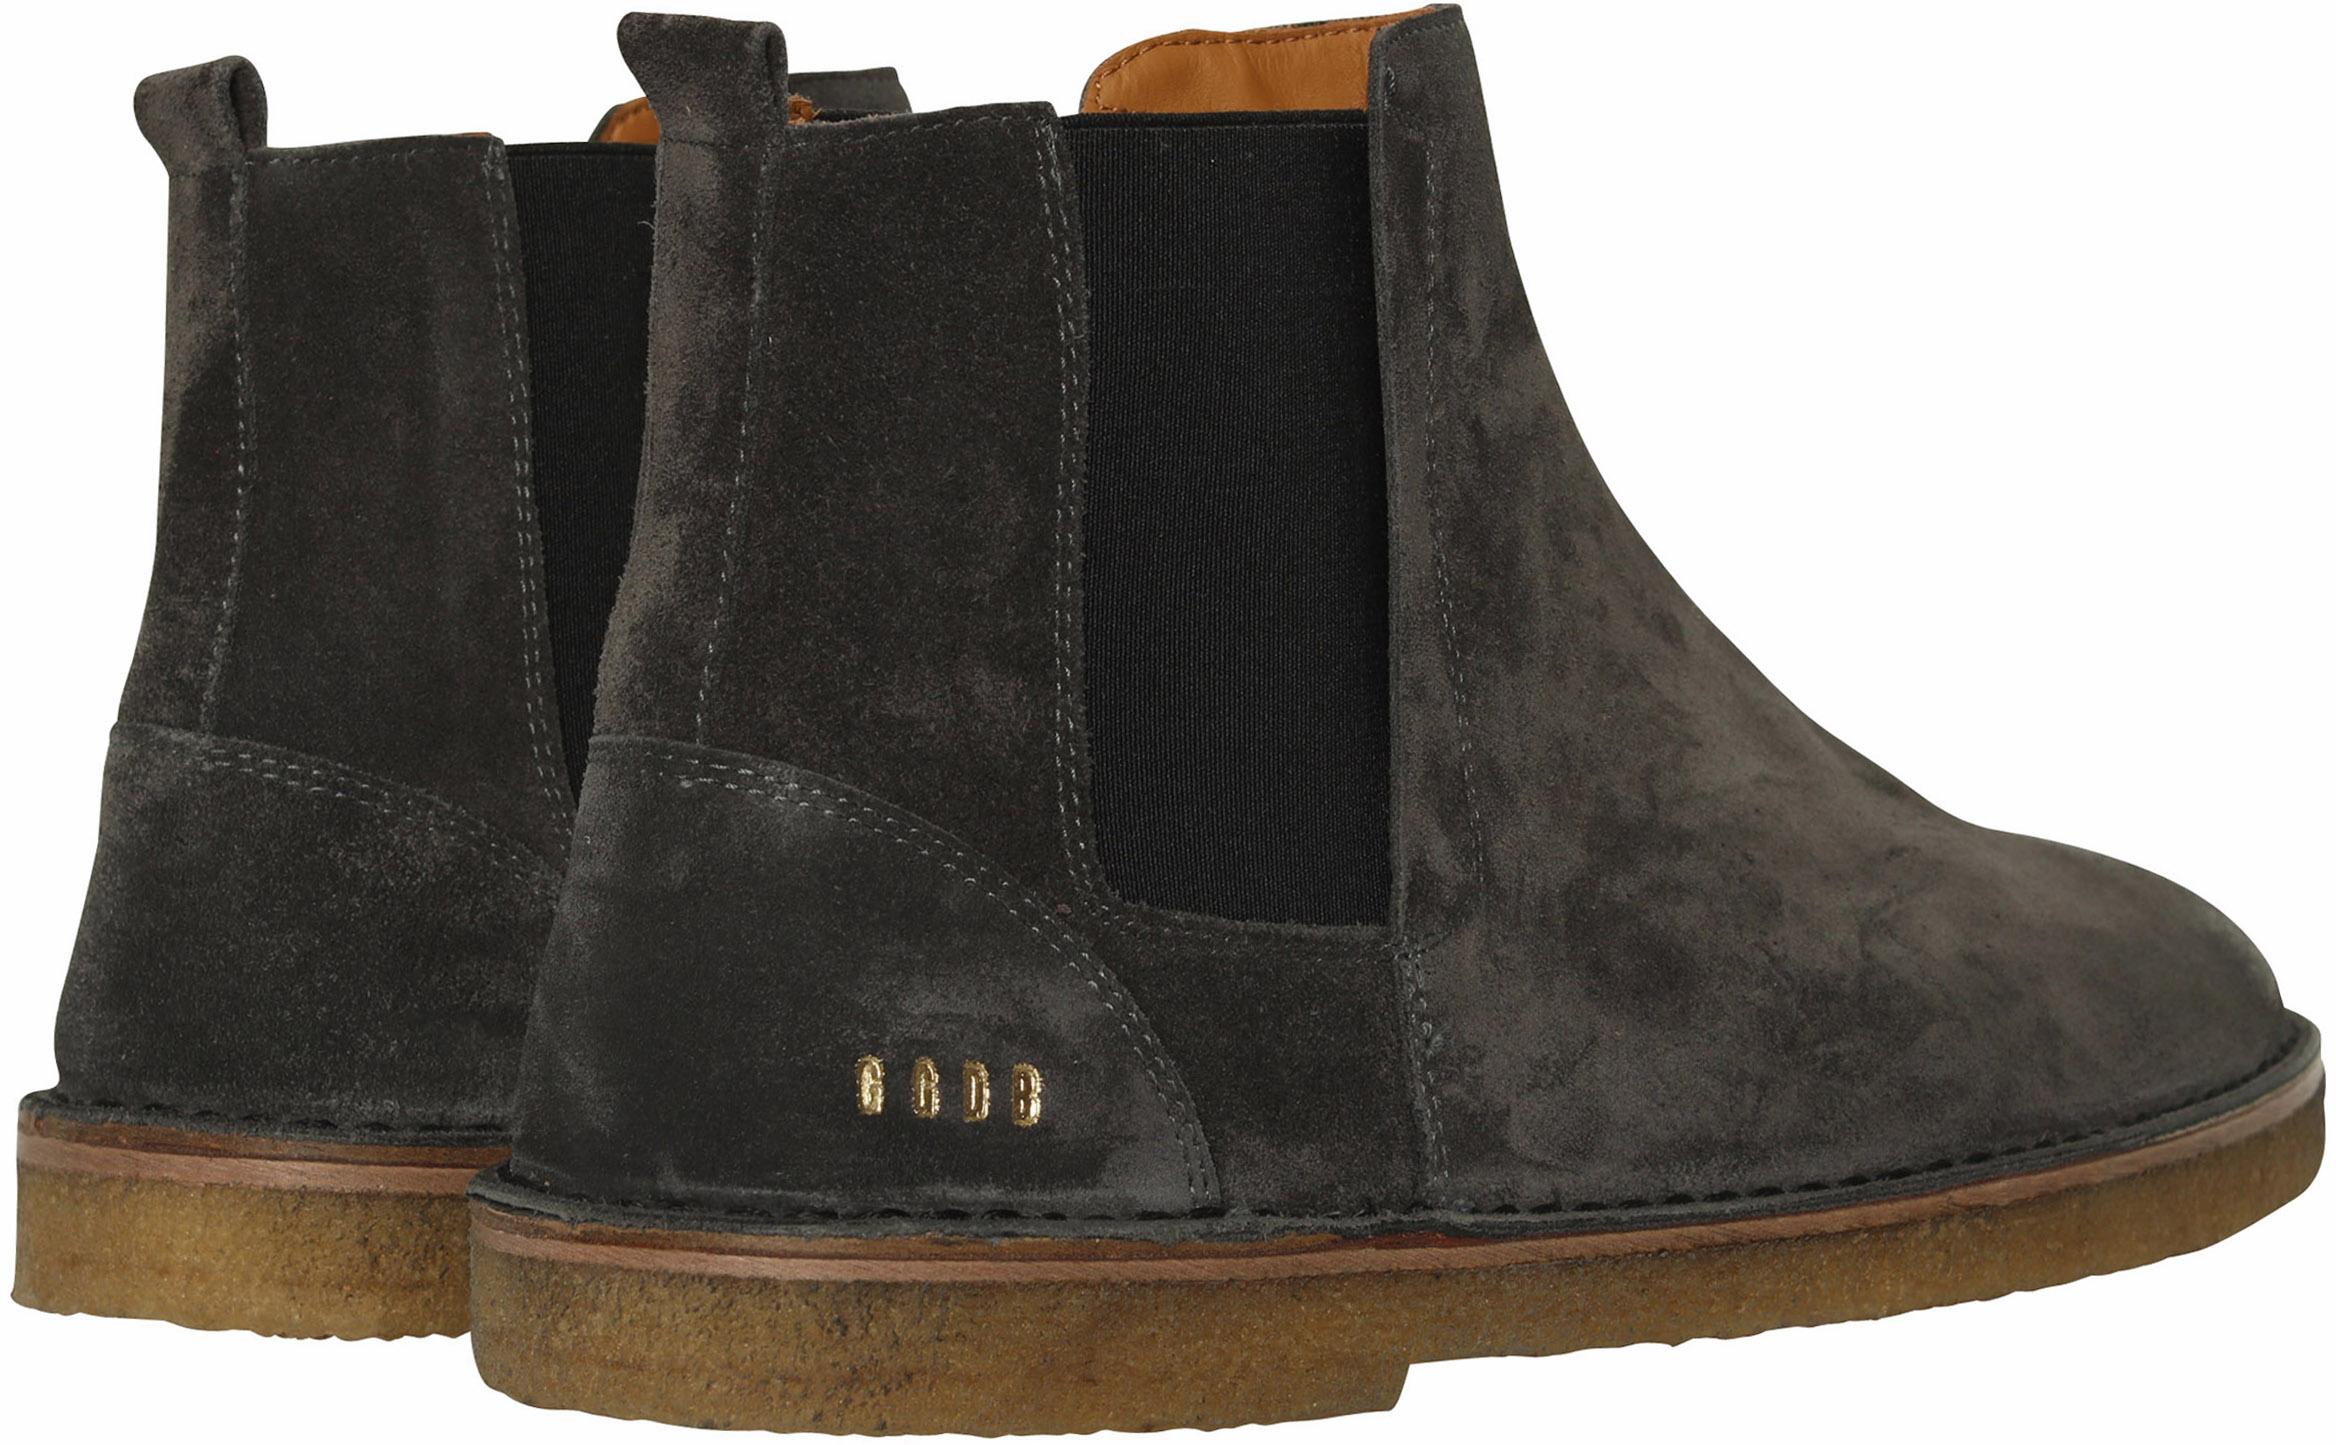 d570e96f13a899 ... Vorschau: Men's Golden Goose Boots Portman Darkgrey Suede